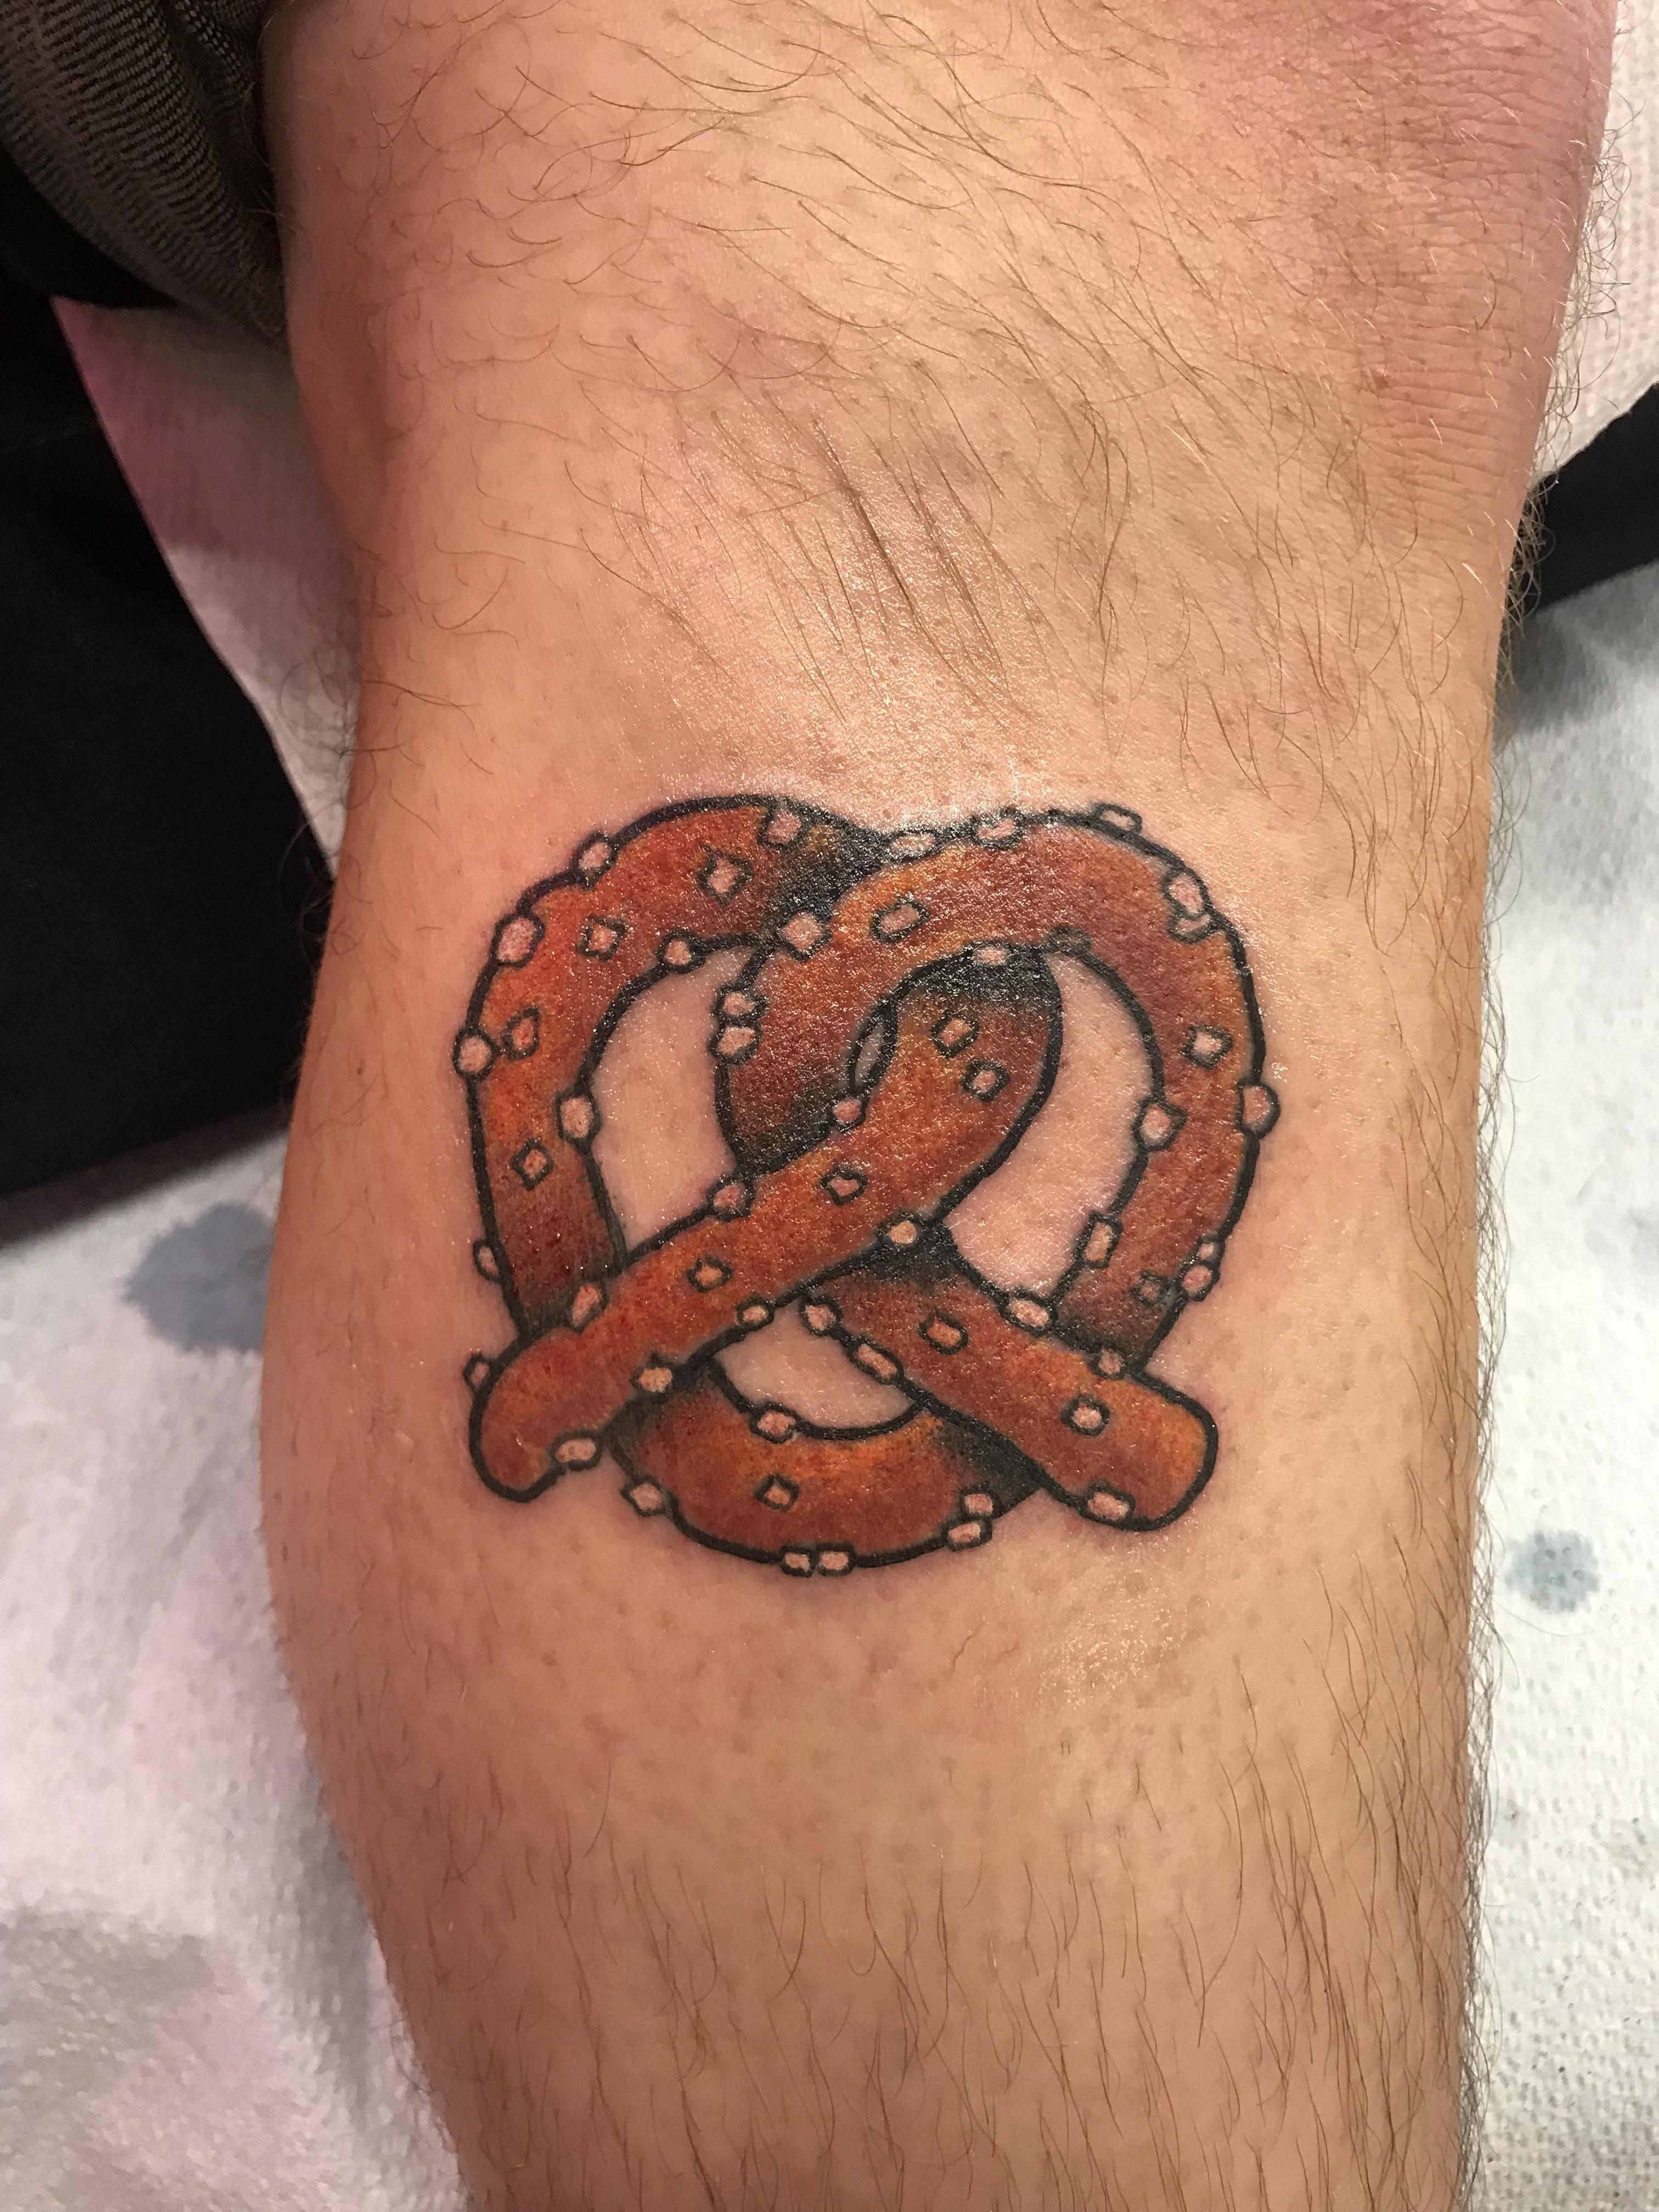 30 Pretzel Tattoo Ideas For Men – Salty Snack Designs